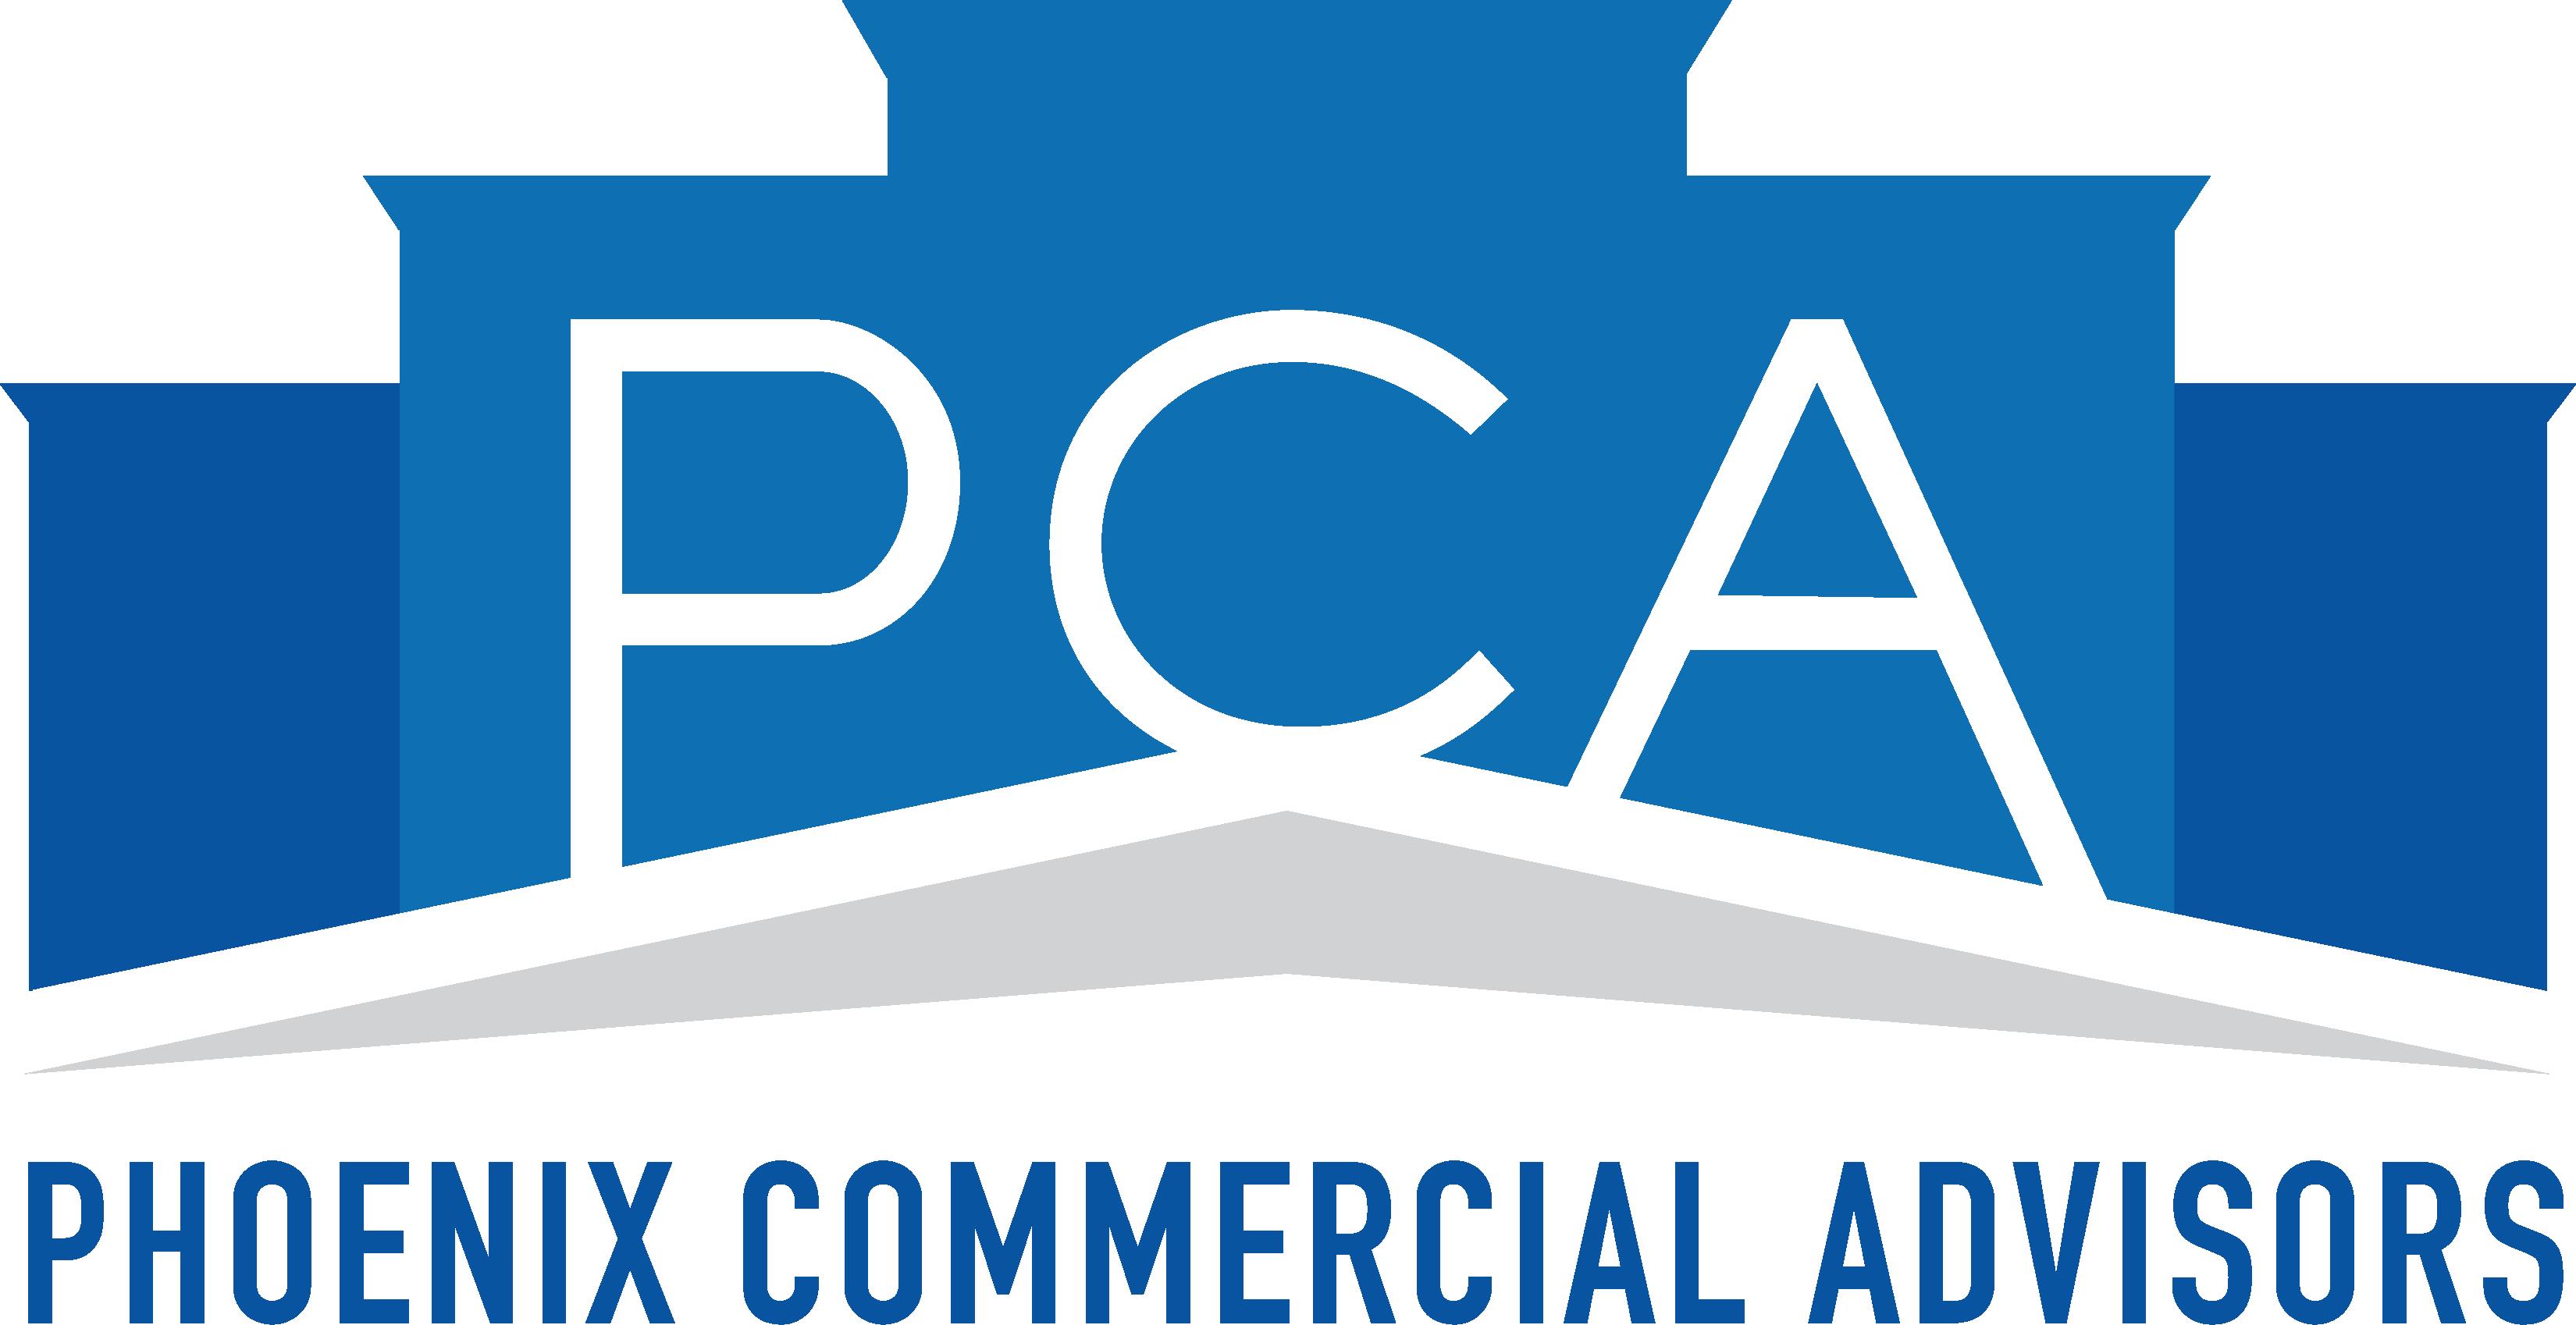 Phoenix Commercial Advisors to Use SiteSeer Pro